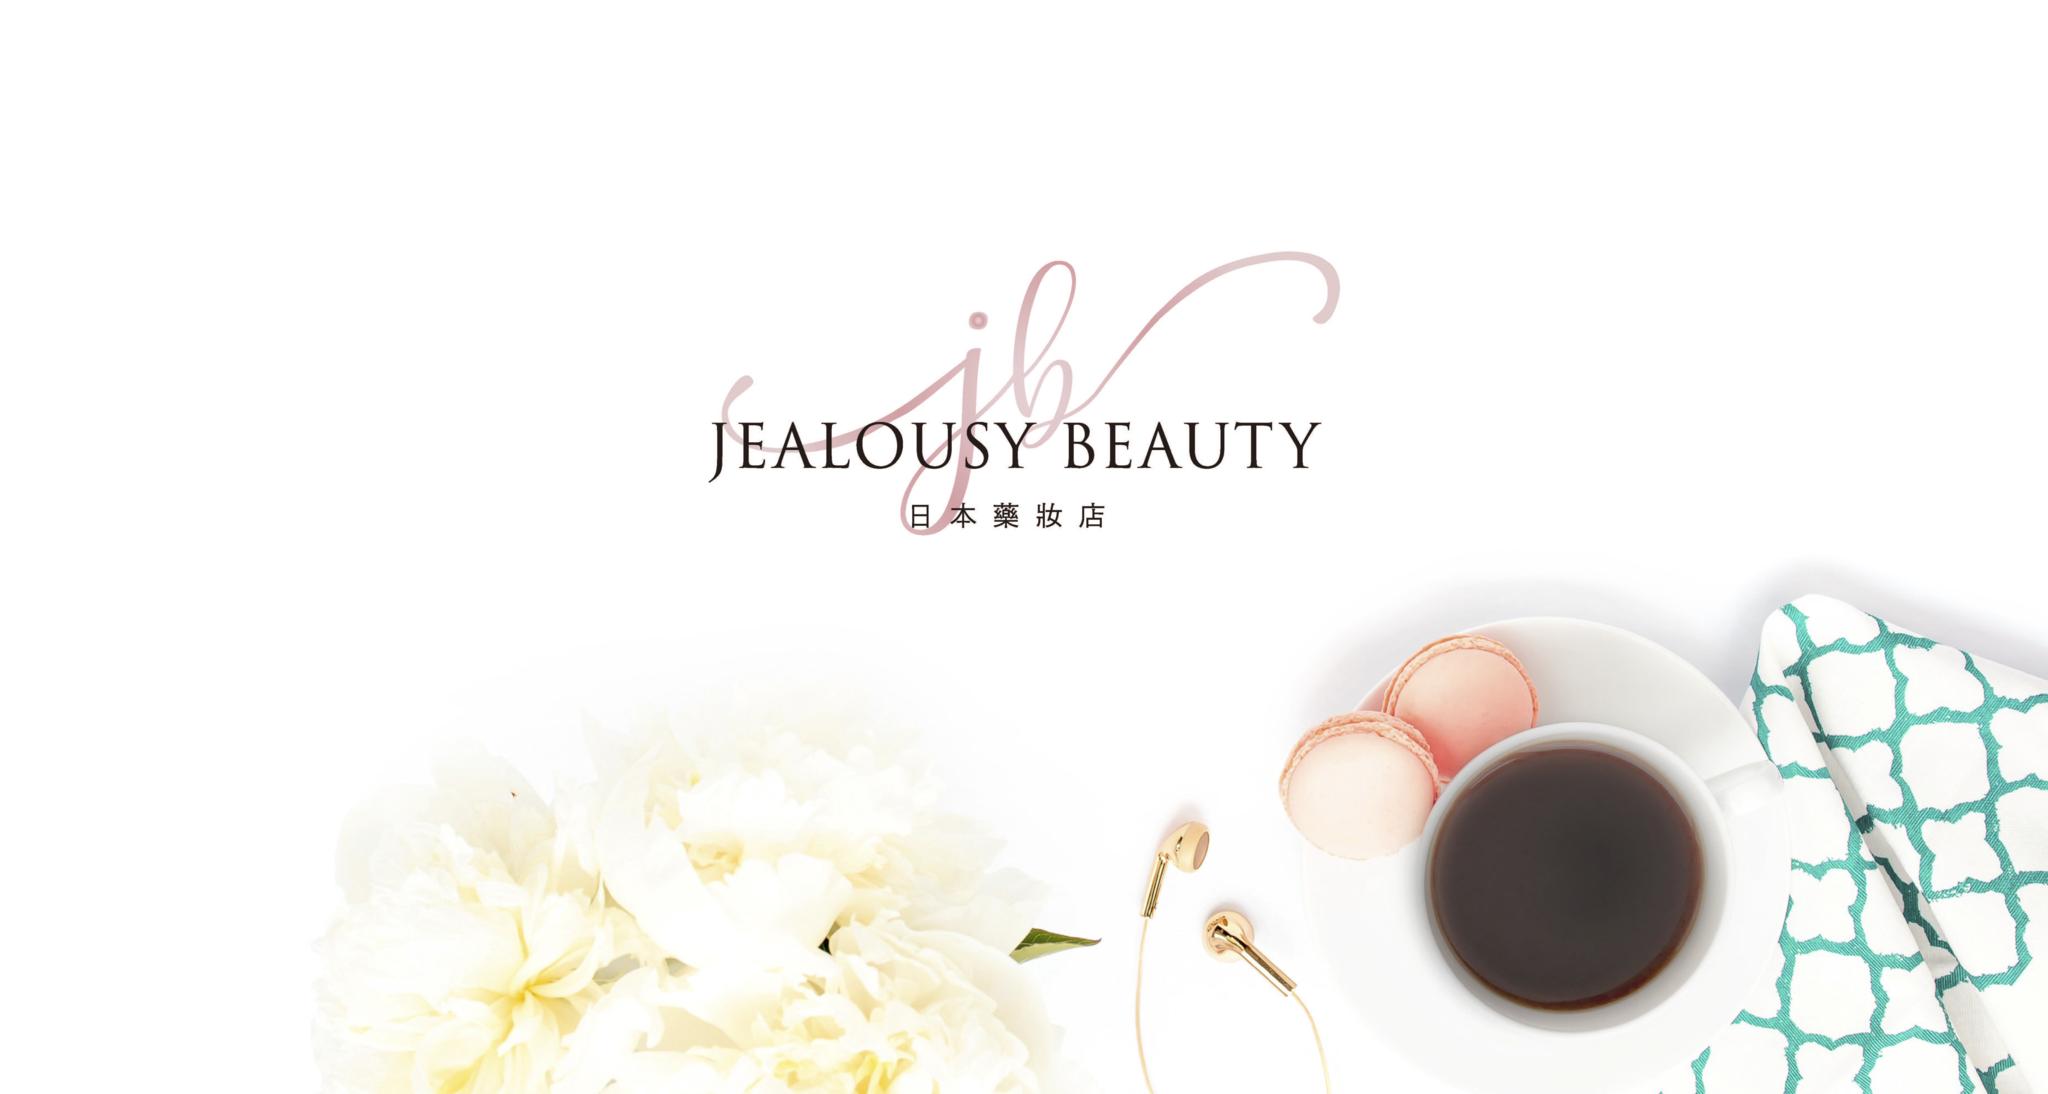 Jealousy-summer theme 2019